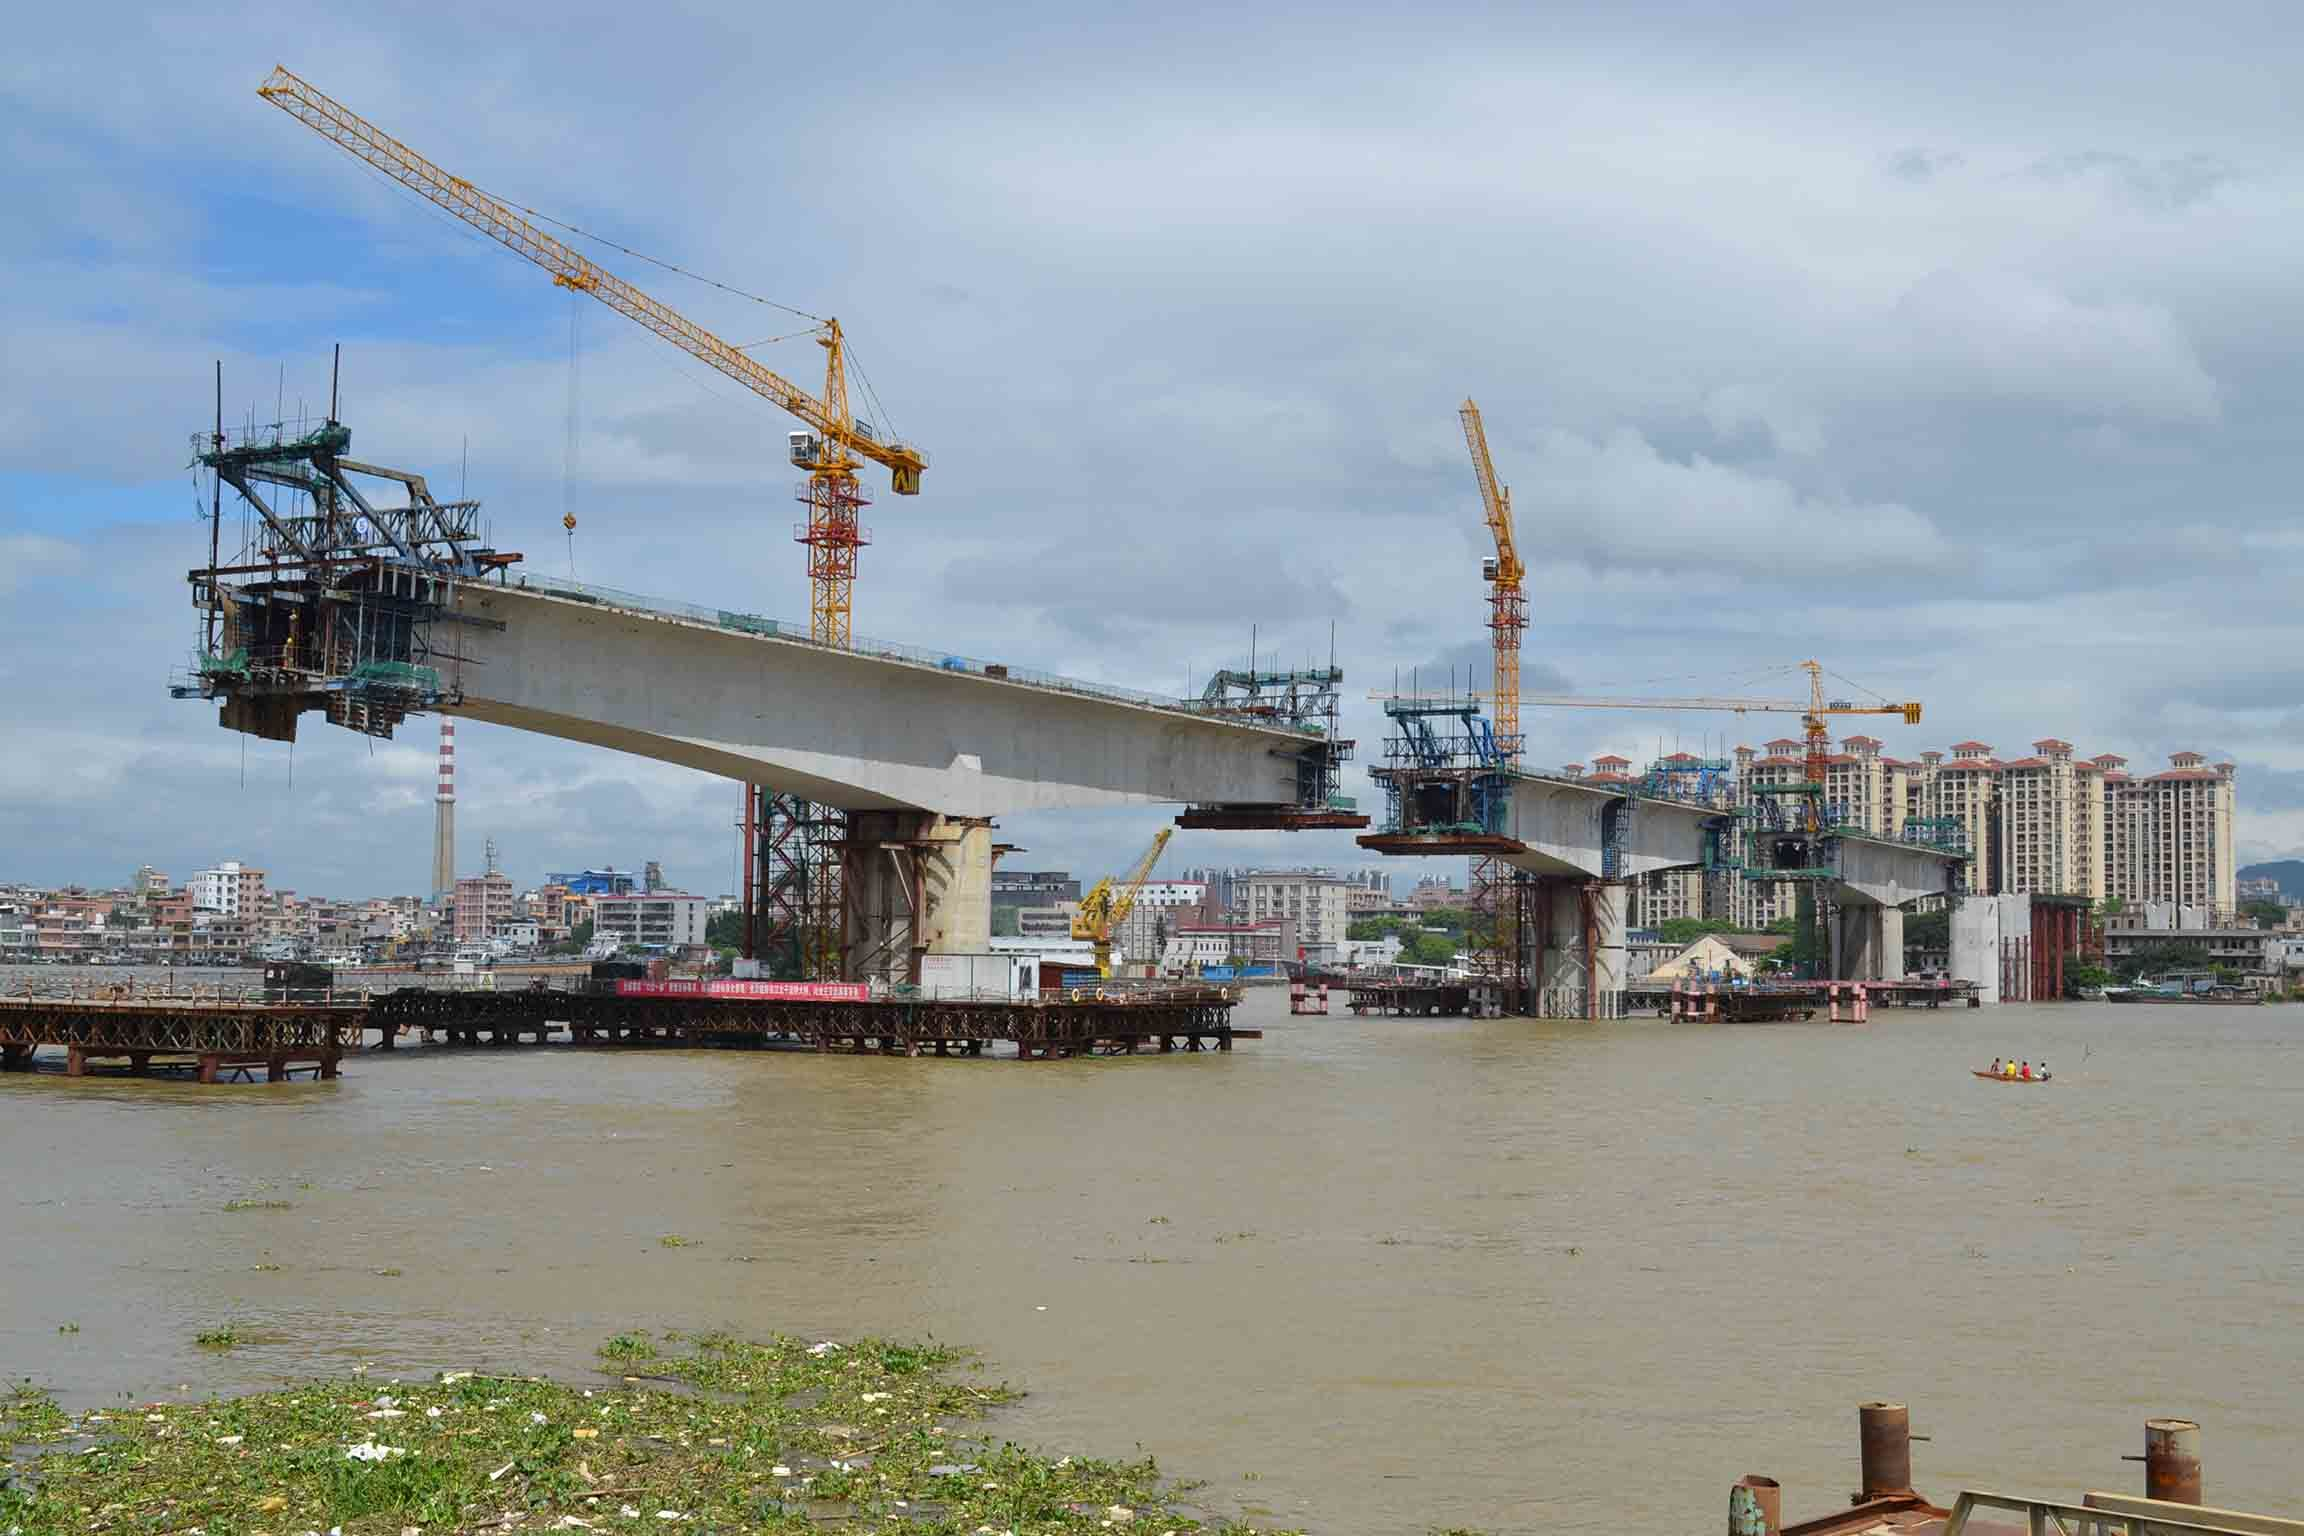 6t Qtz80 (TC6013B) and Maximum Height of 210m Construction Crane